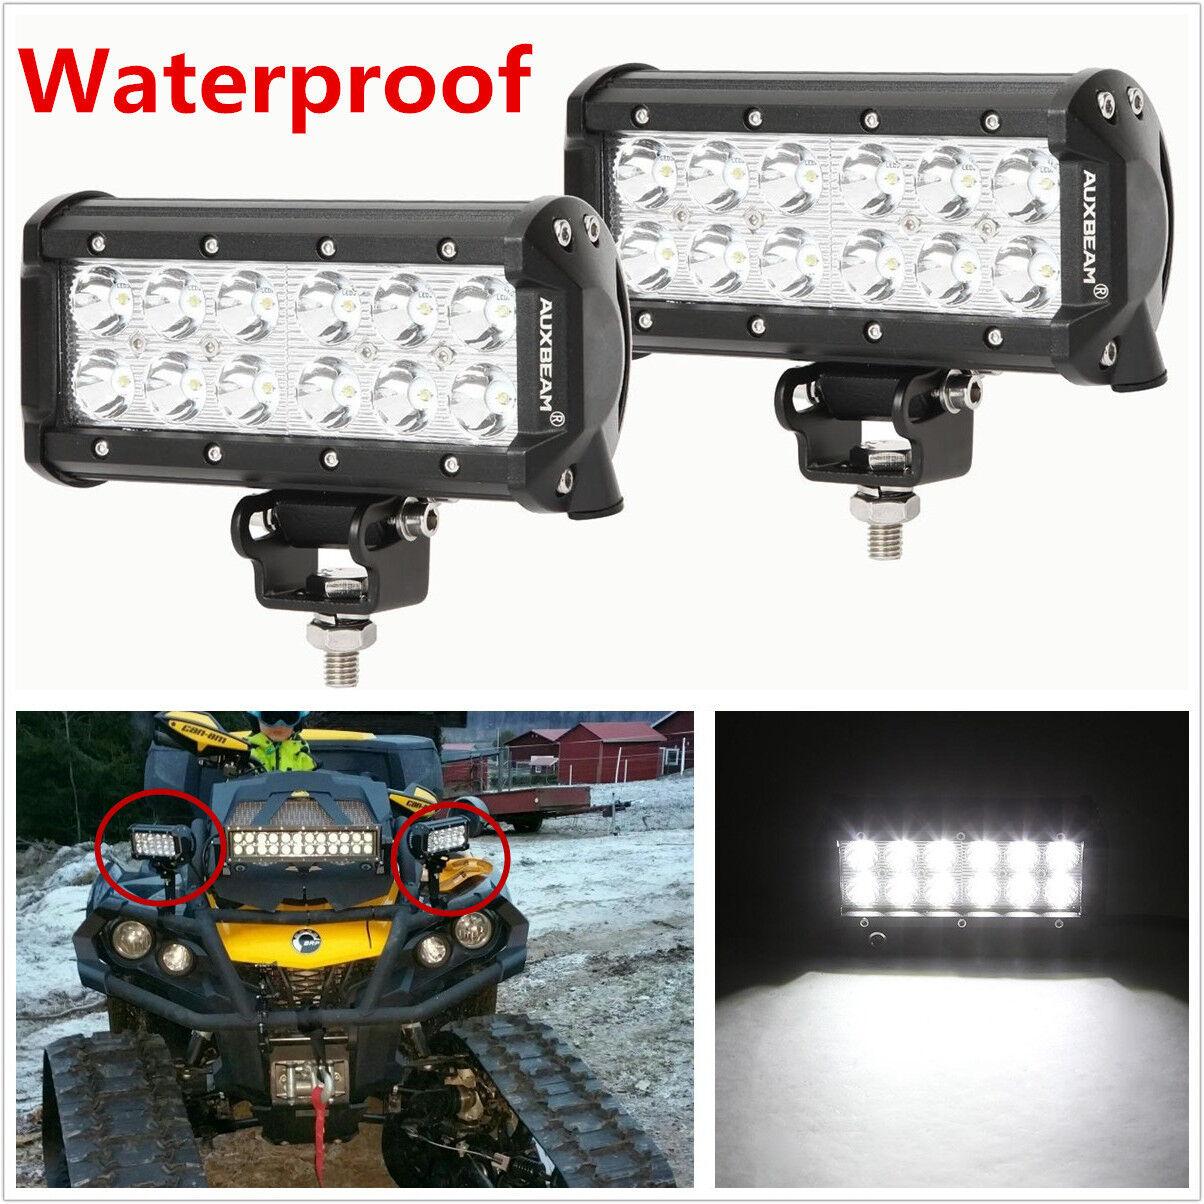 "2 Pcs 9-32V 6500K 7"" LED CREE Car SUV 4X4 Working Lights Flood Lamps Waterproof"